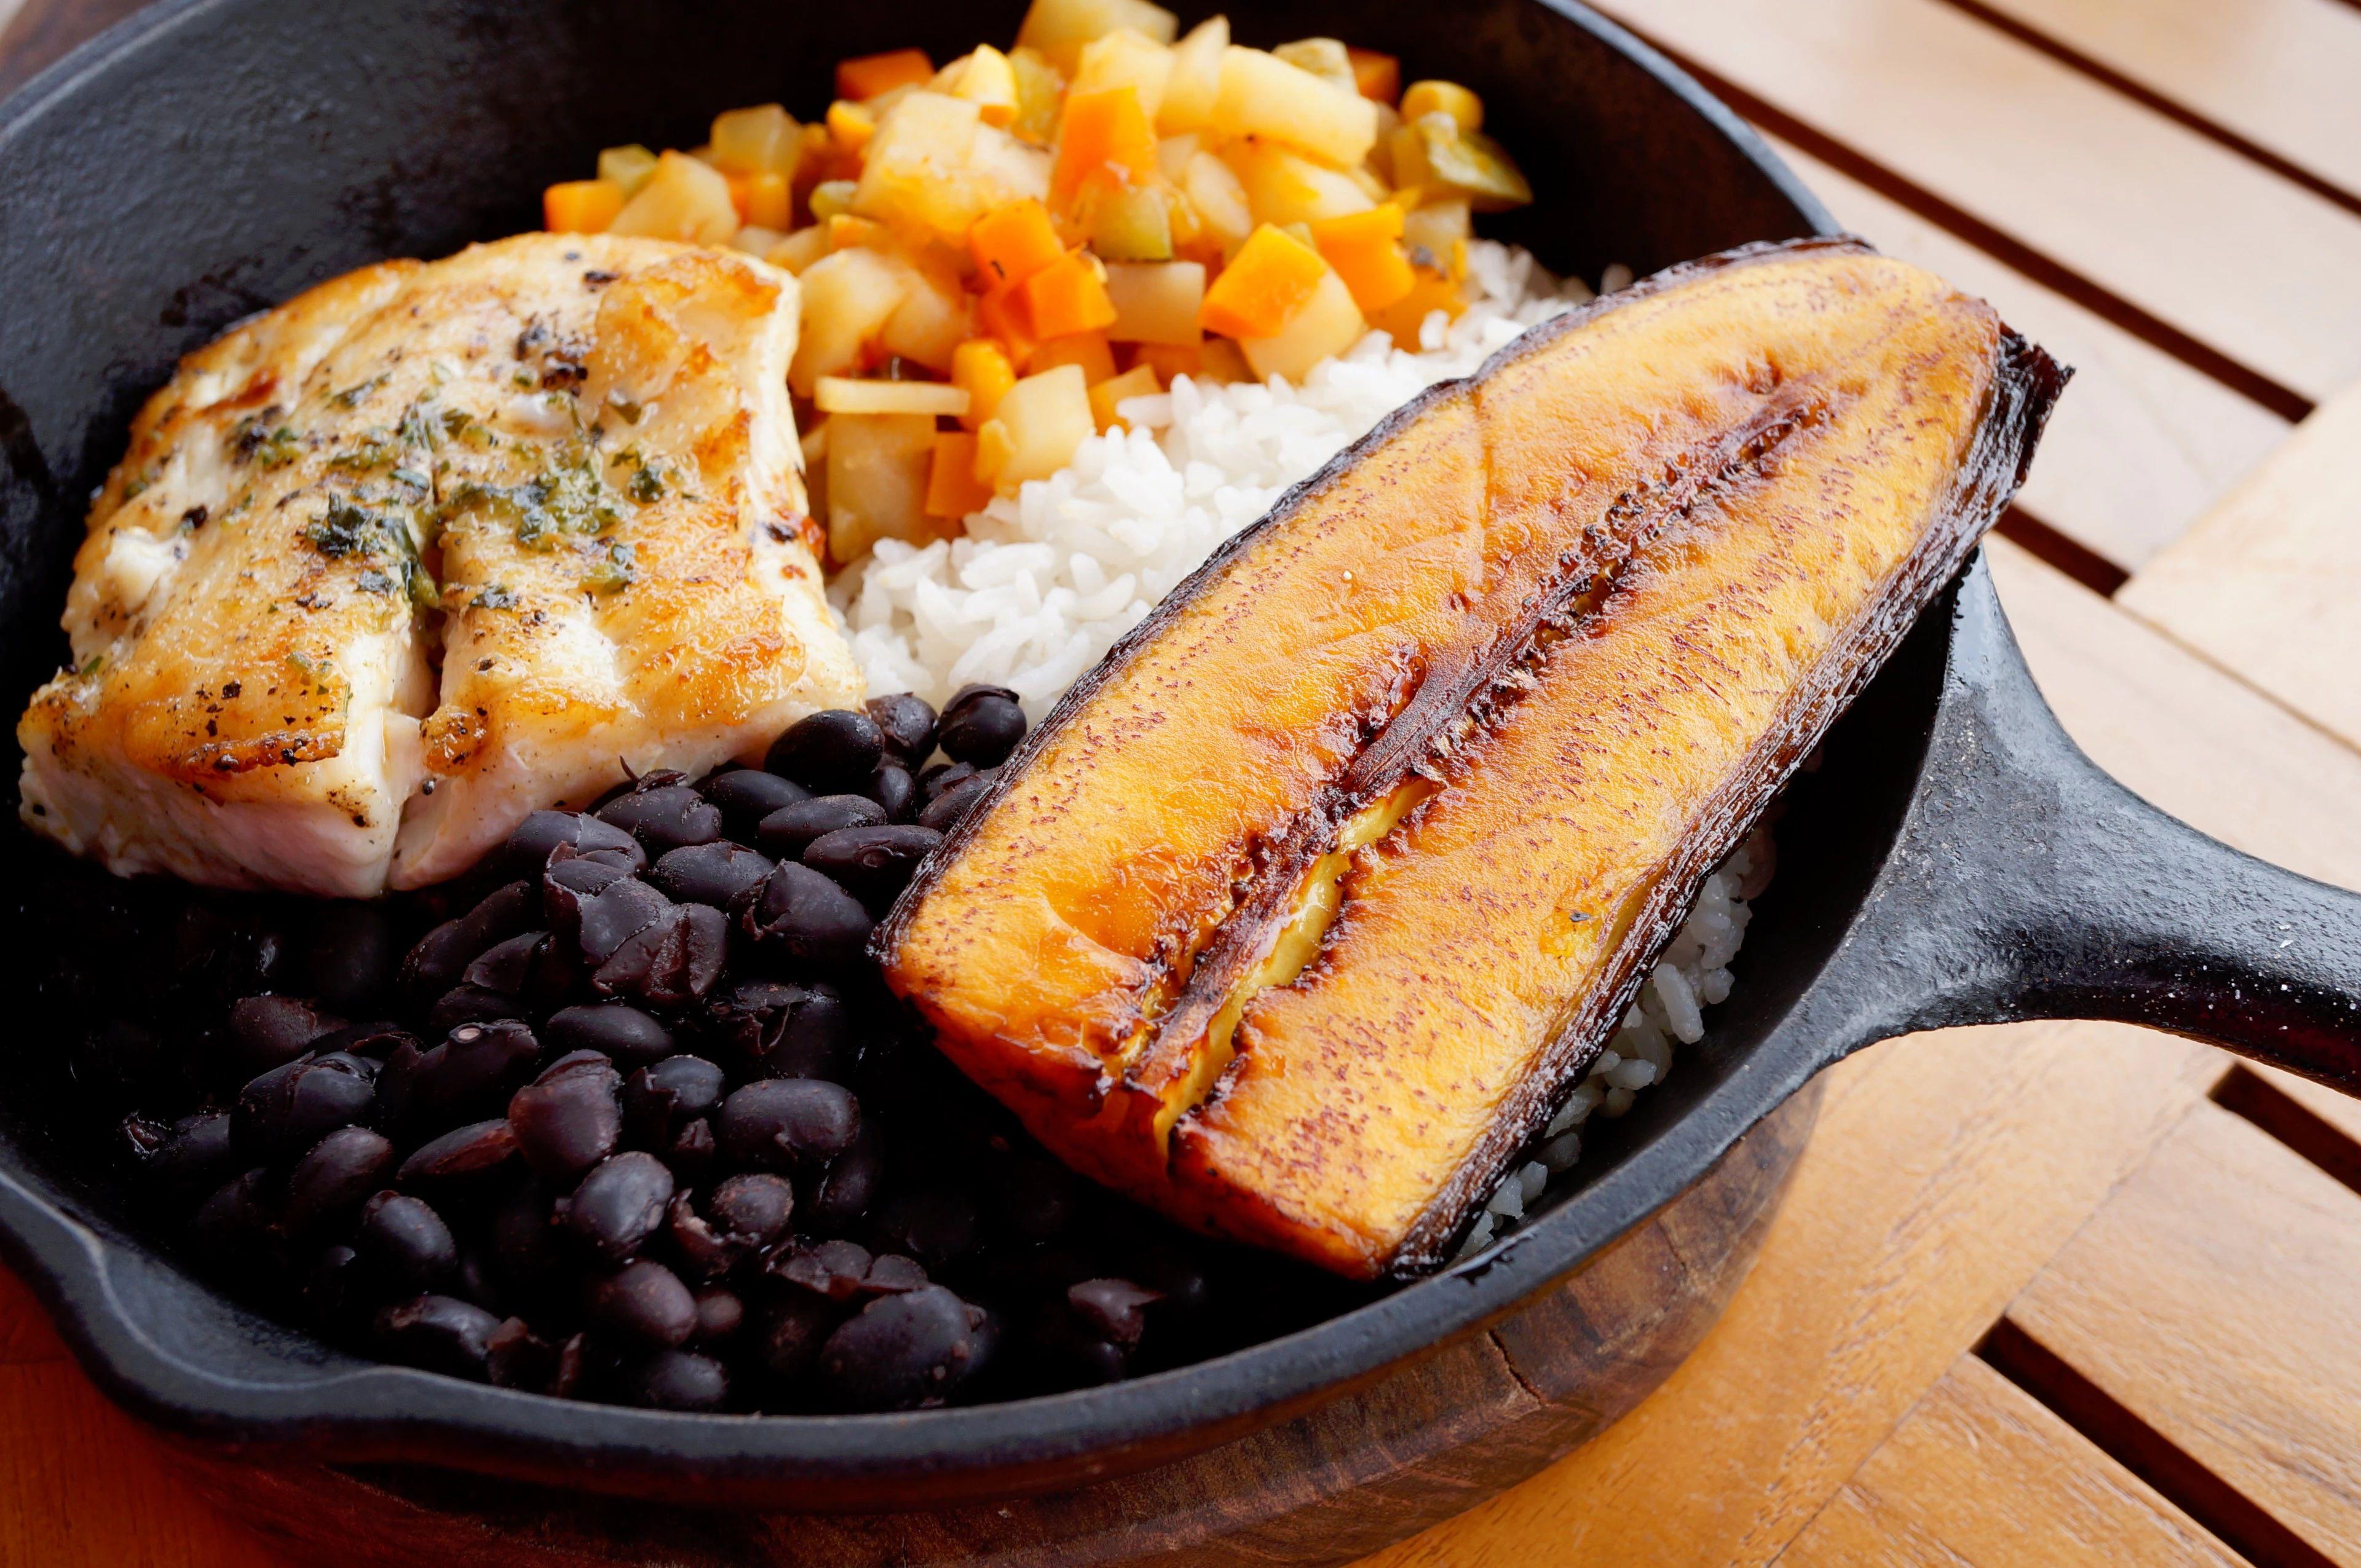 la comida dominicana una oda al multiculturalismo